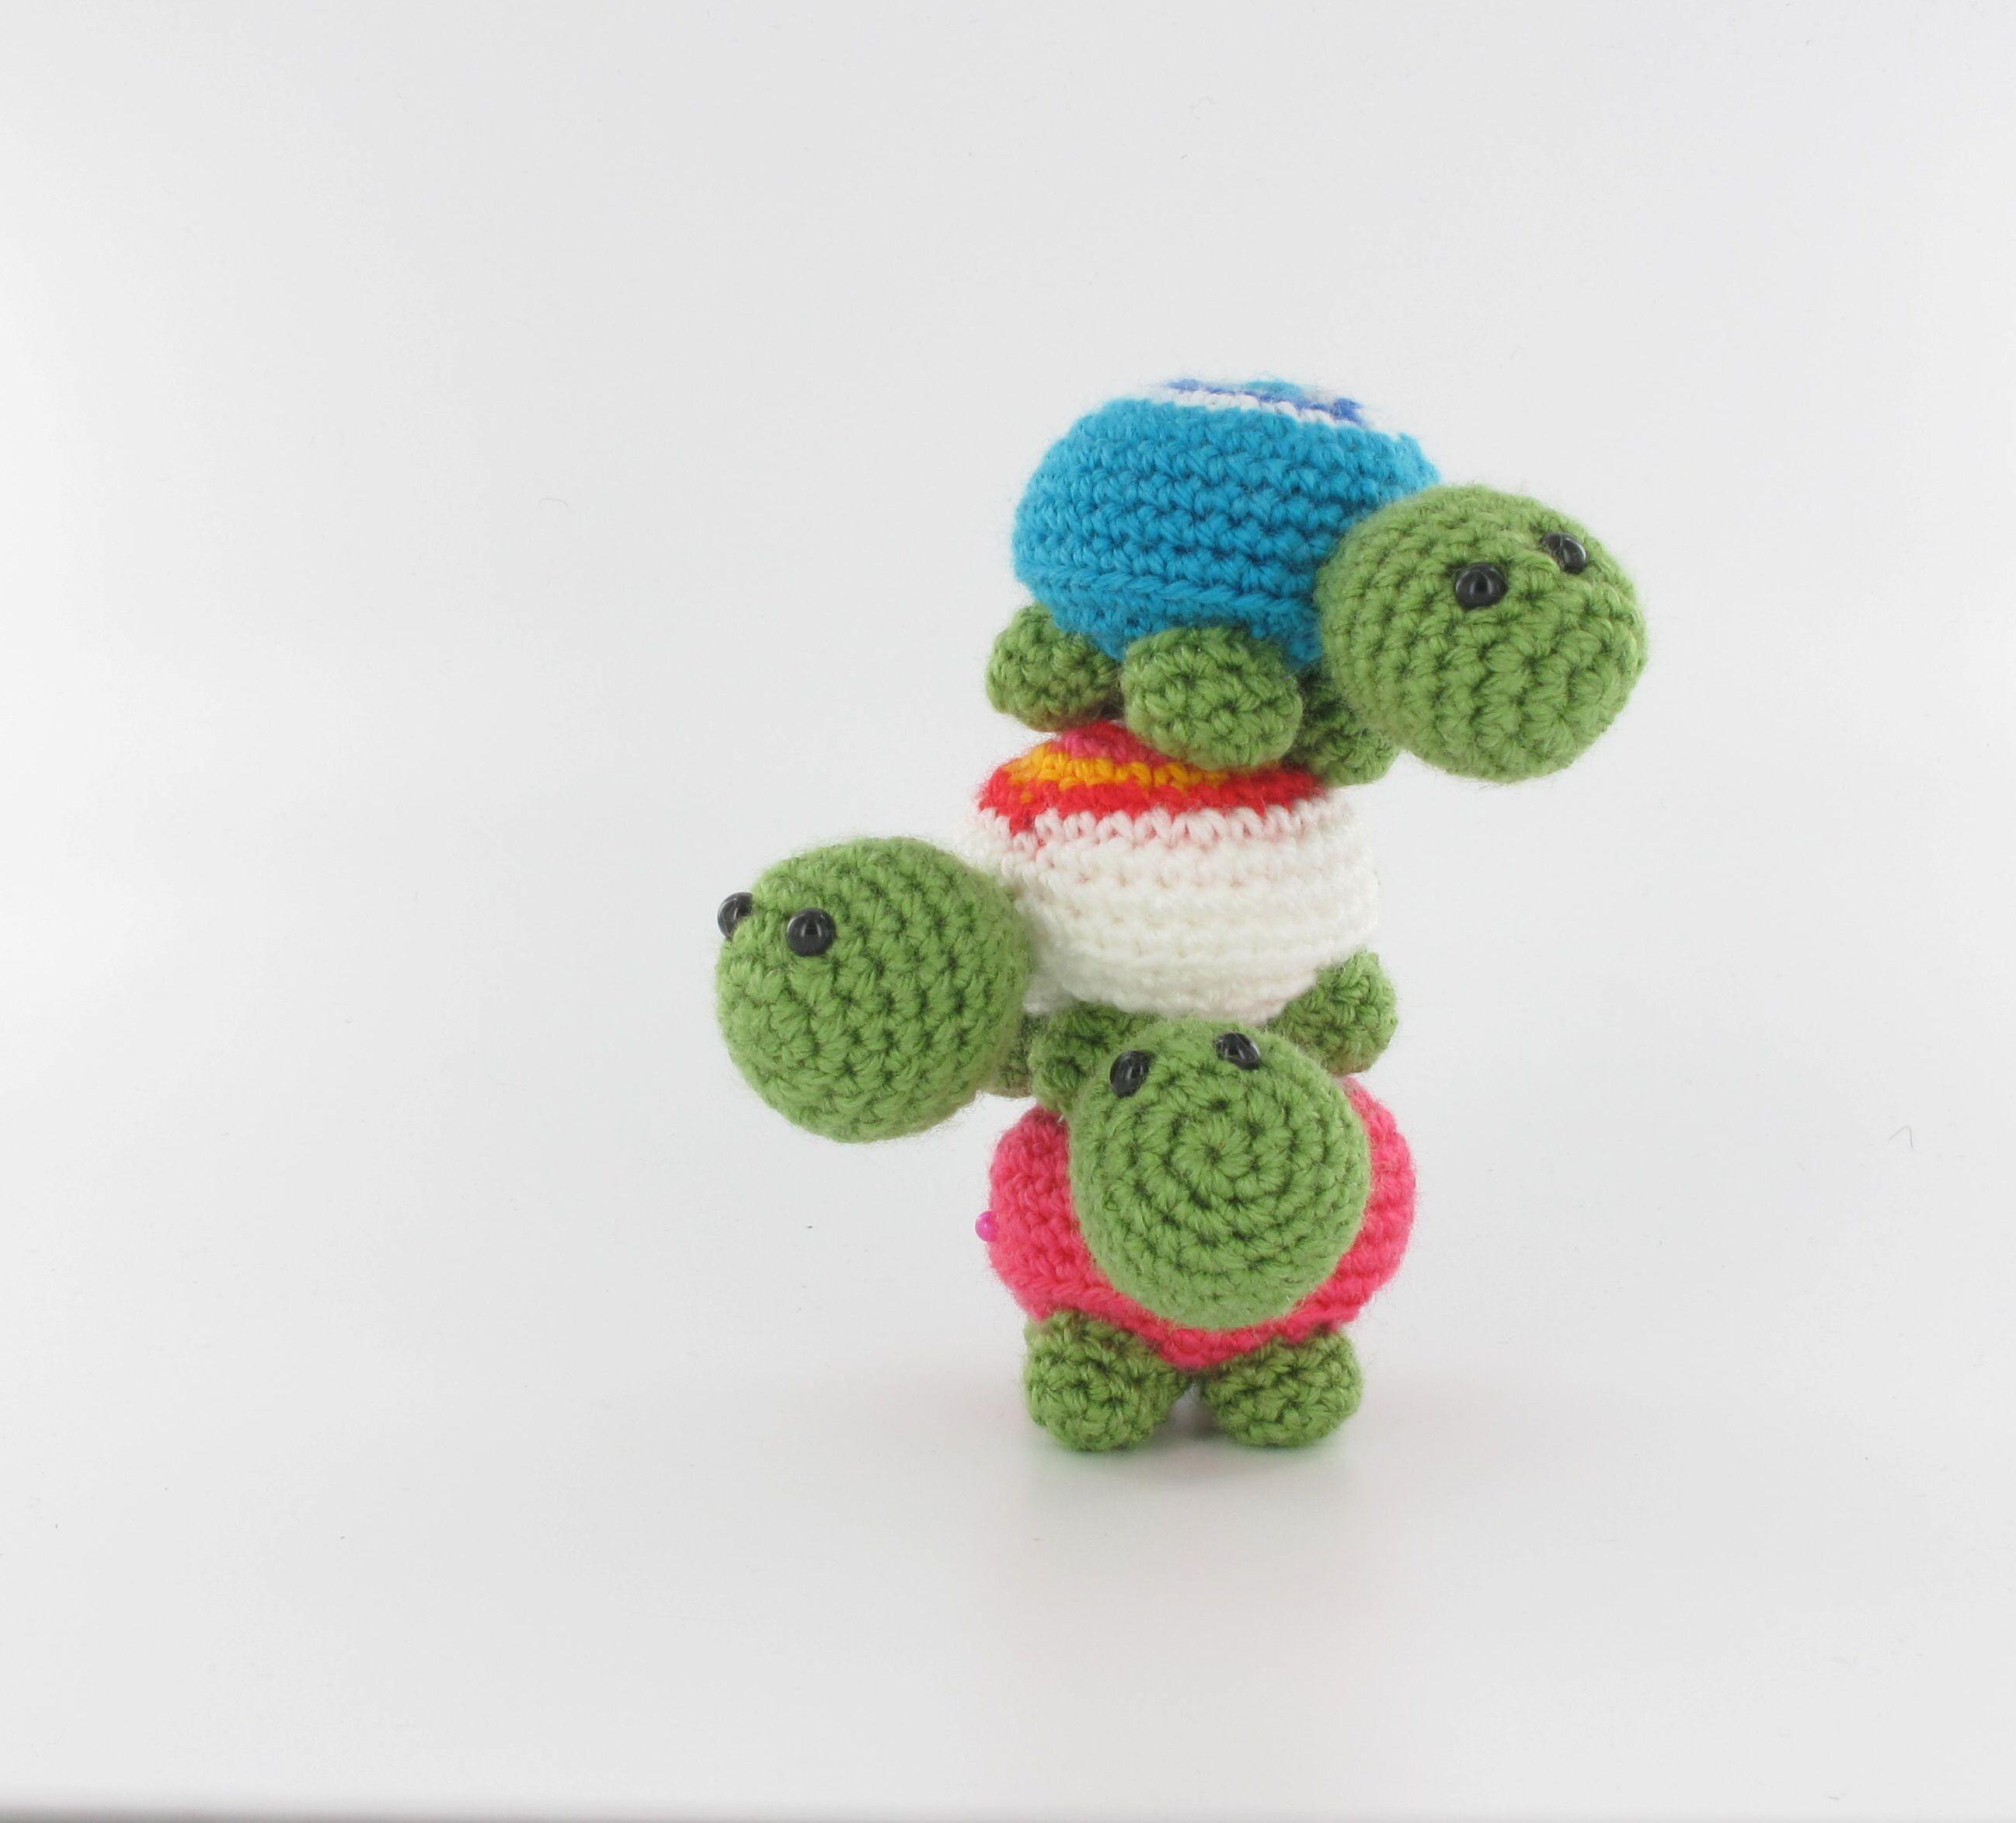 Little turtles from Woolytoons | Woolytoons amigurumi designs ...